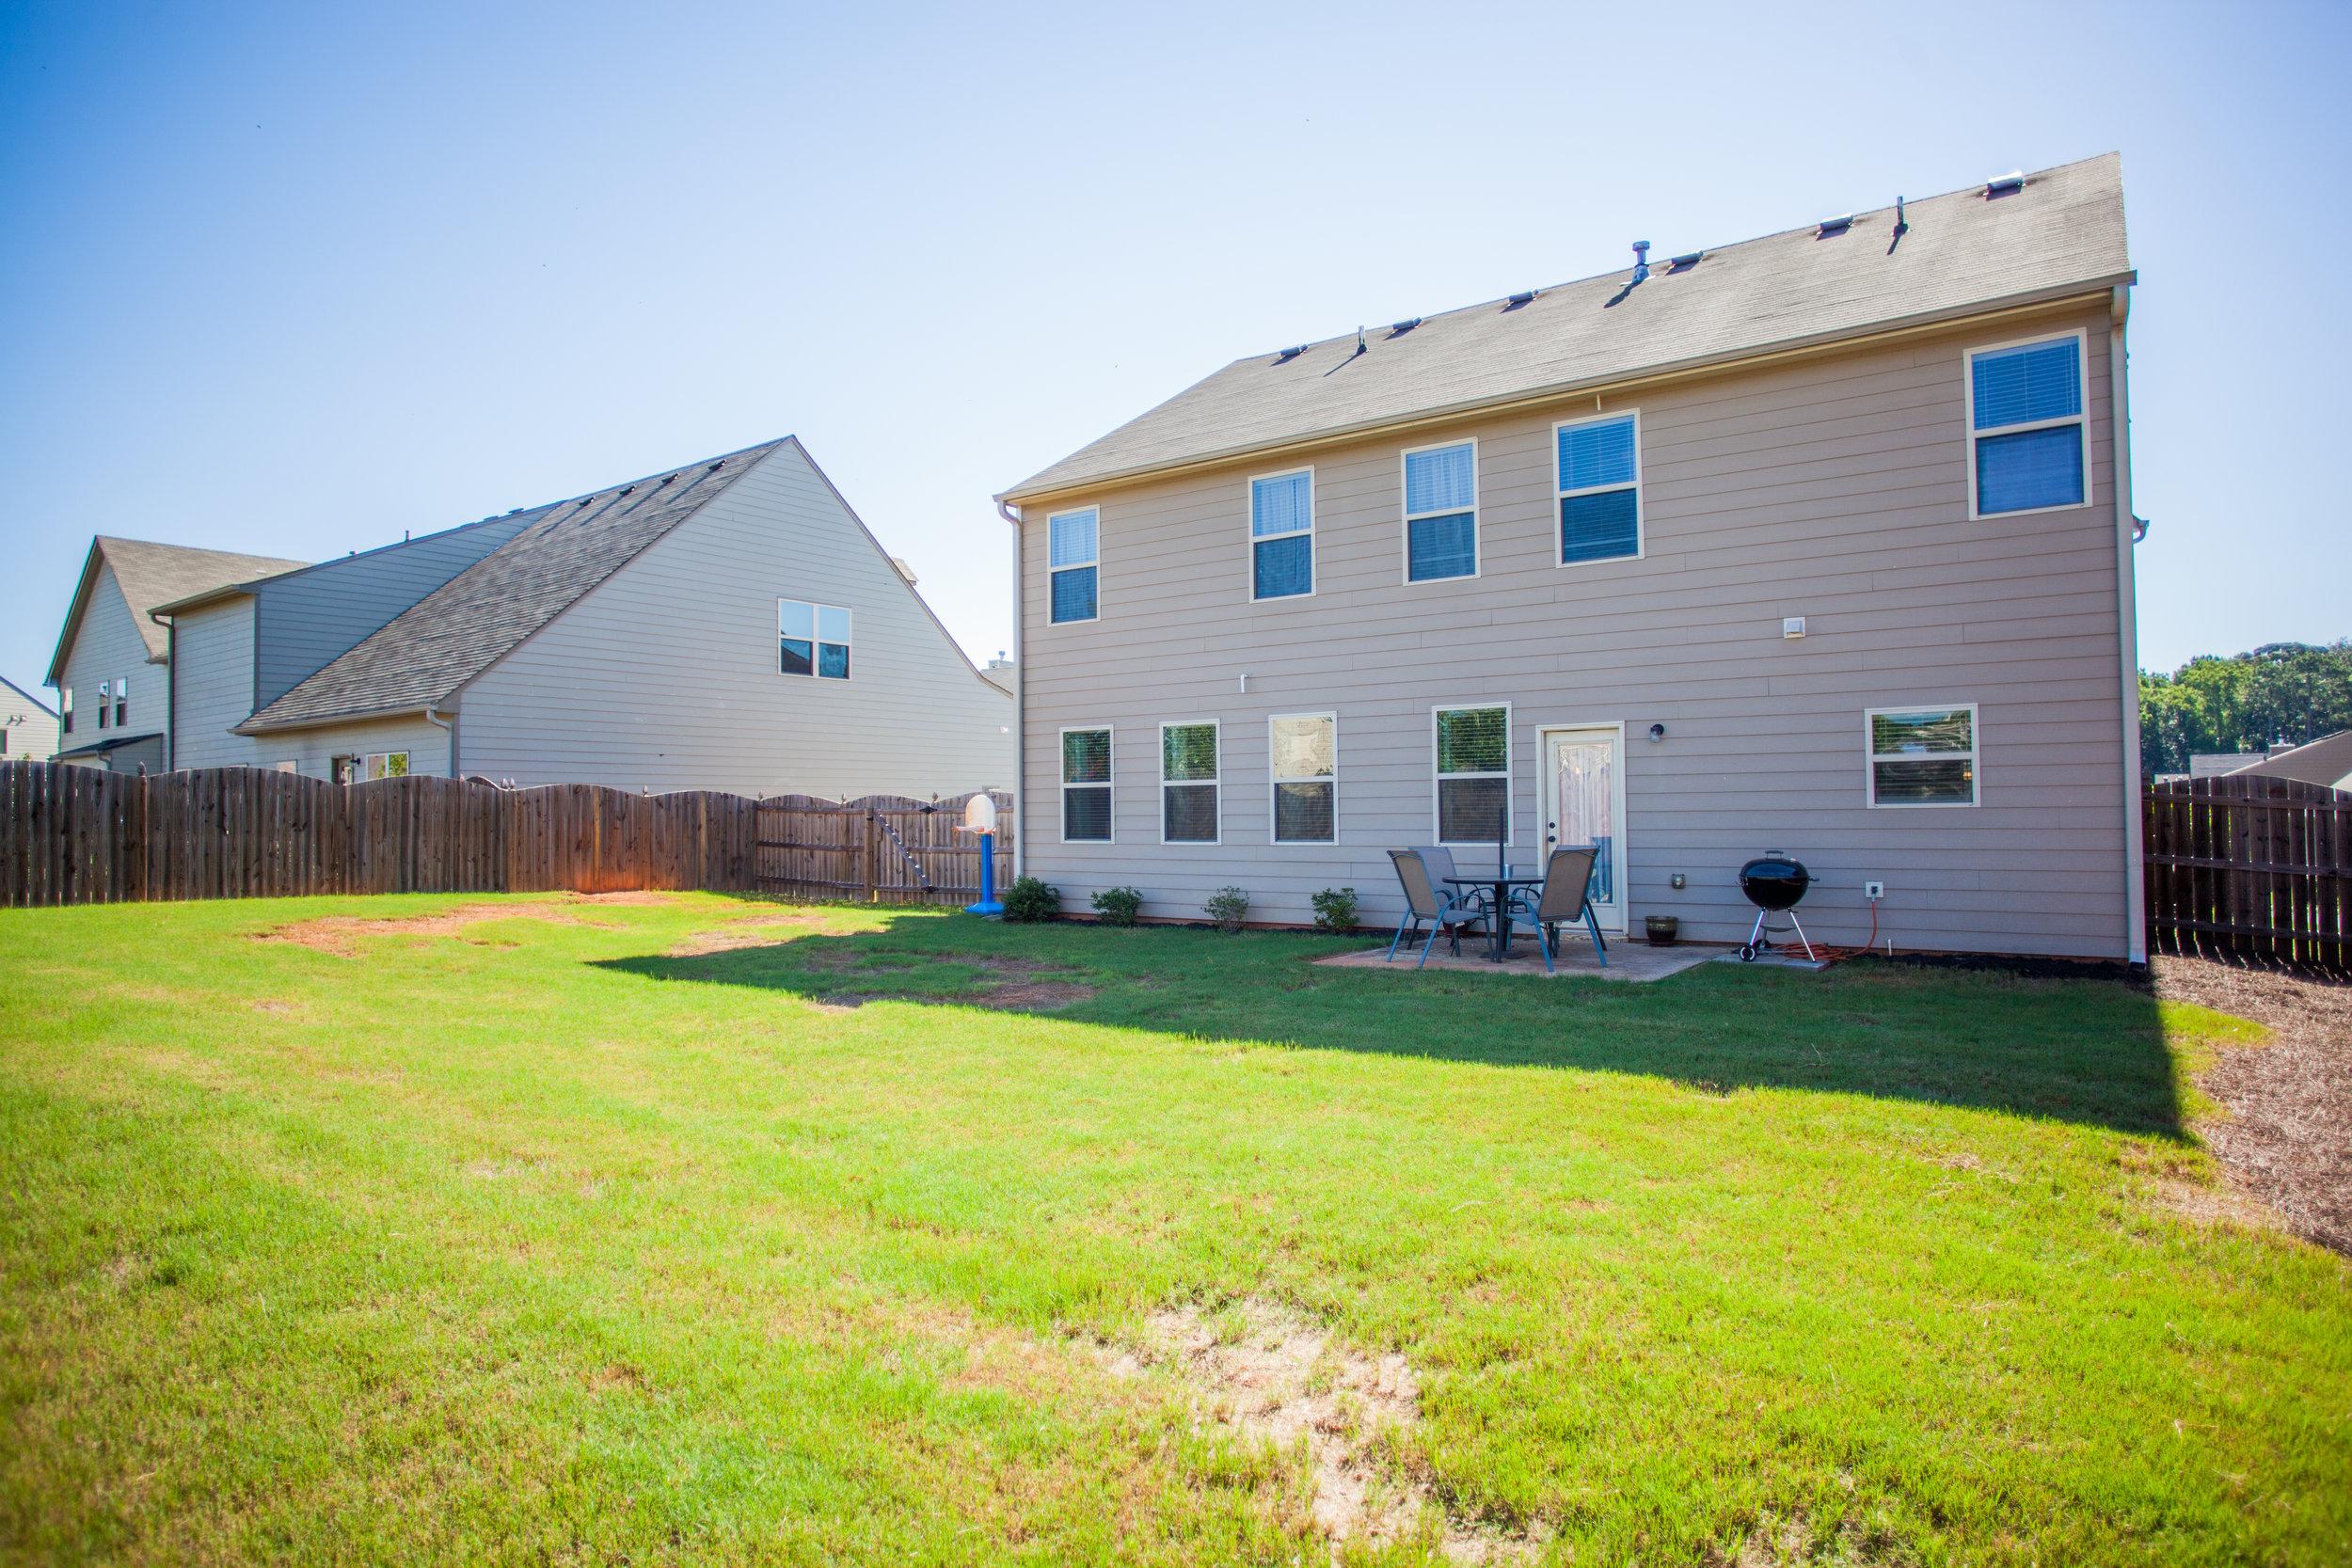 woodstock-ga-house-for-sale-wingard-real-estate-under-300k-52.jpg